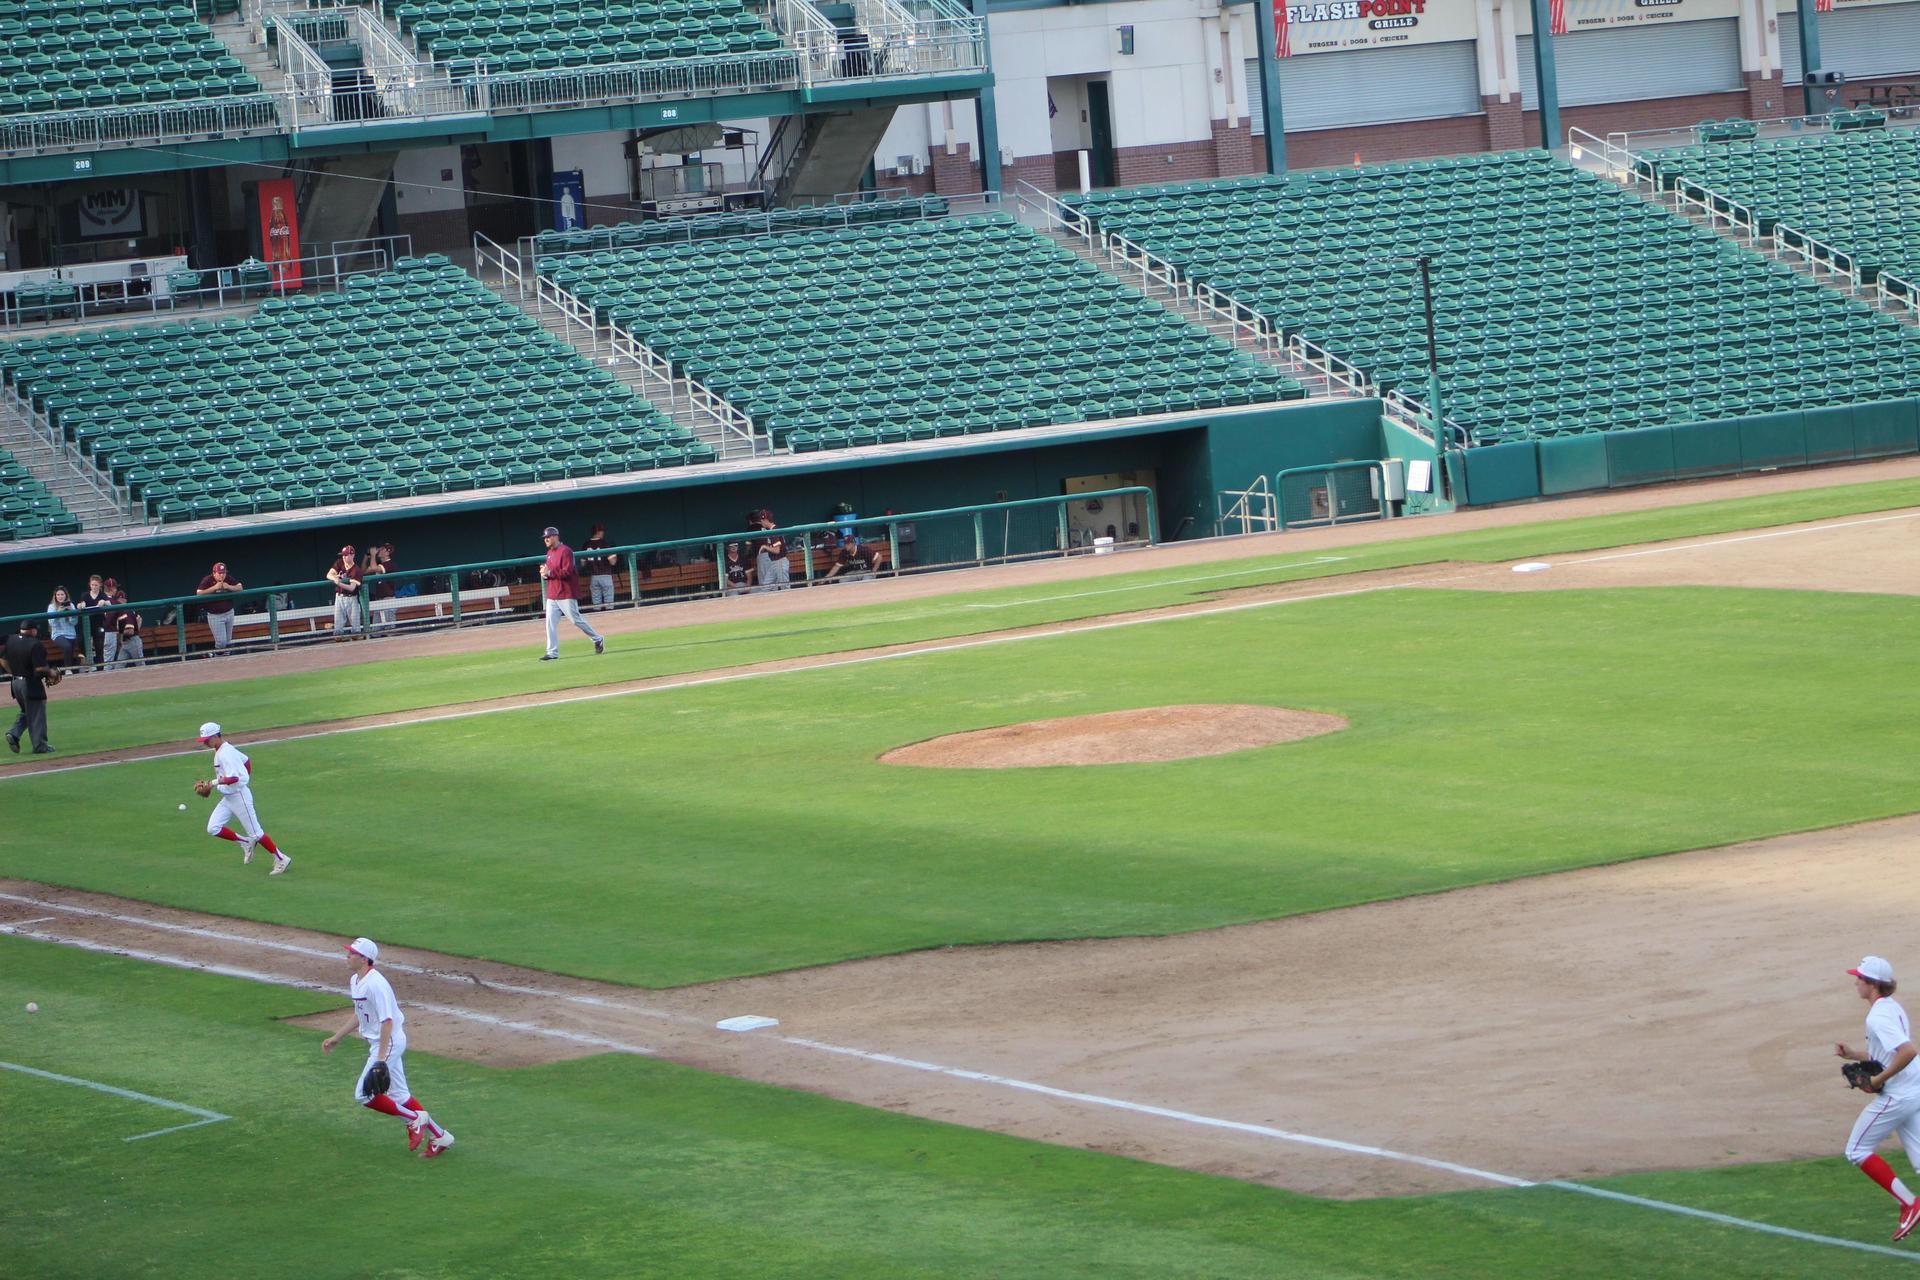 varsity baseball playing against Sierra at Chukchansi Park